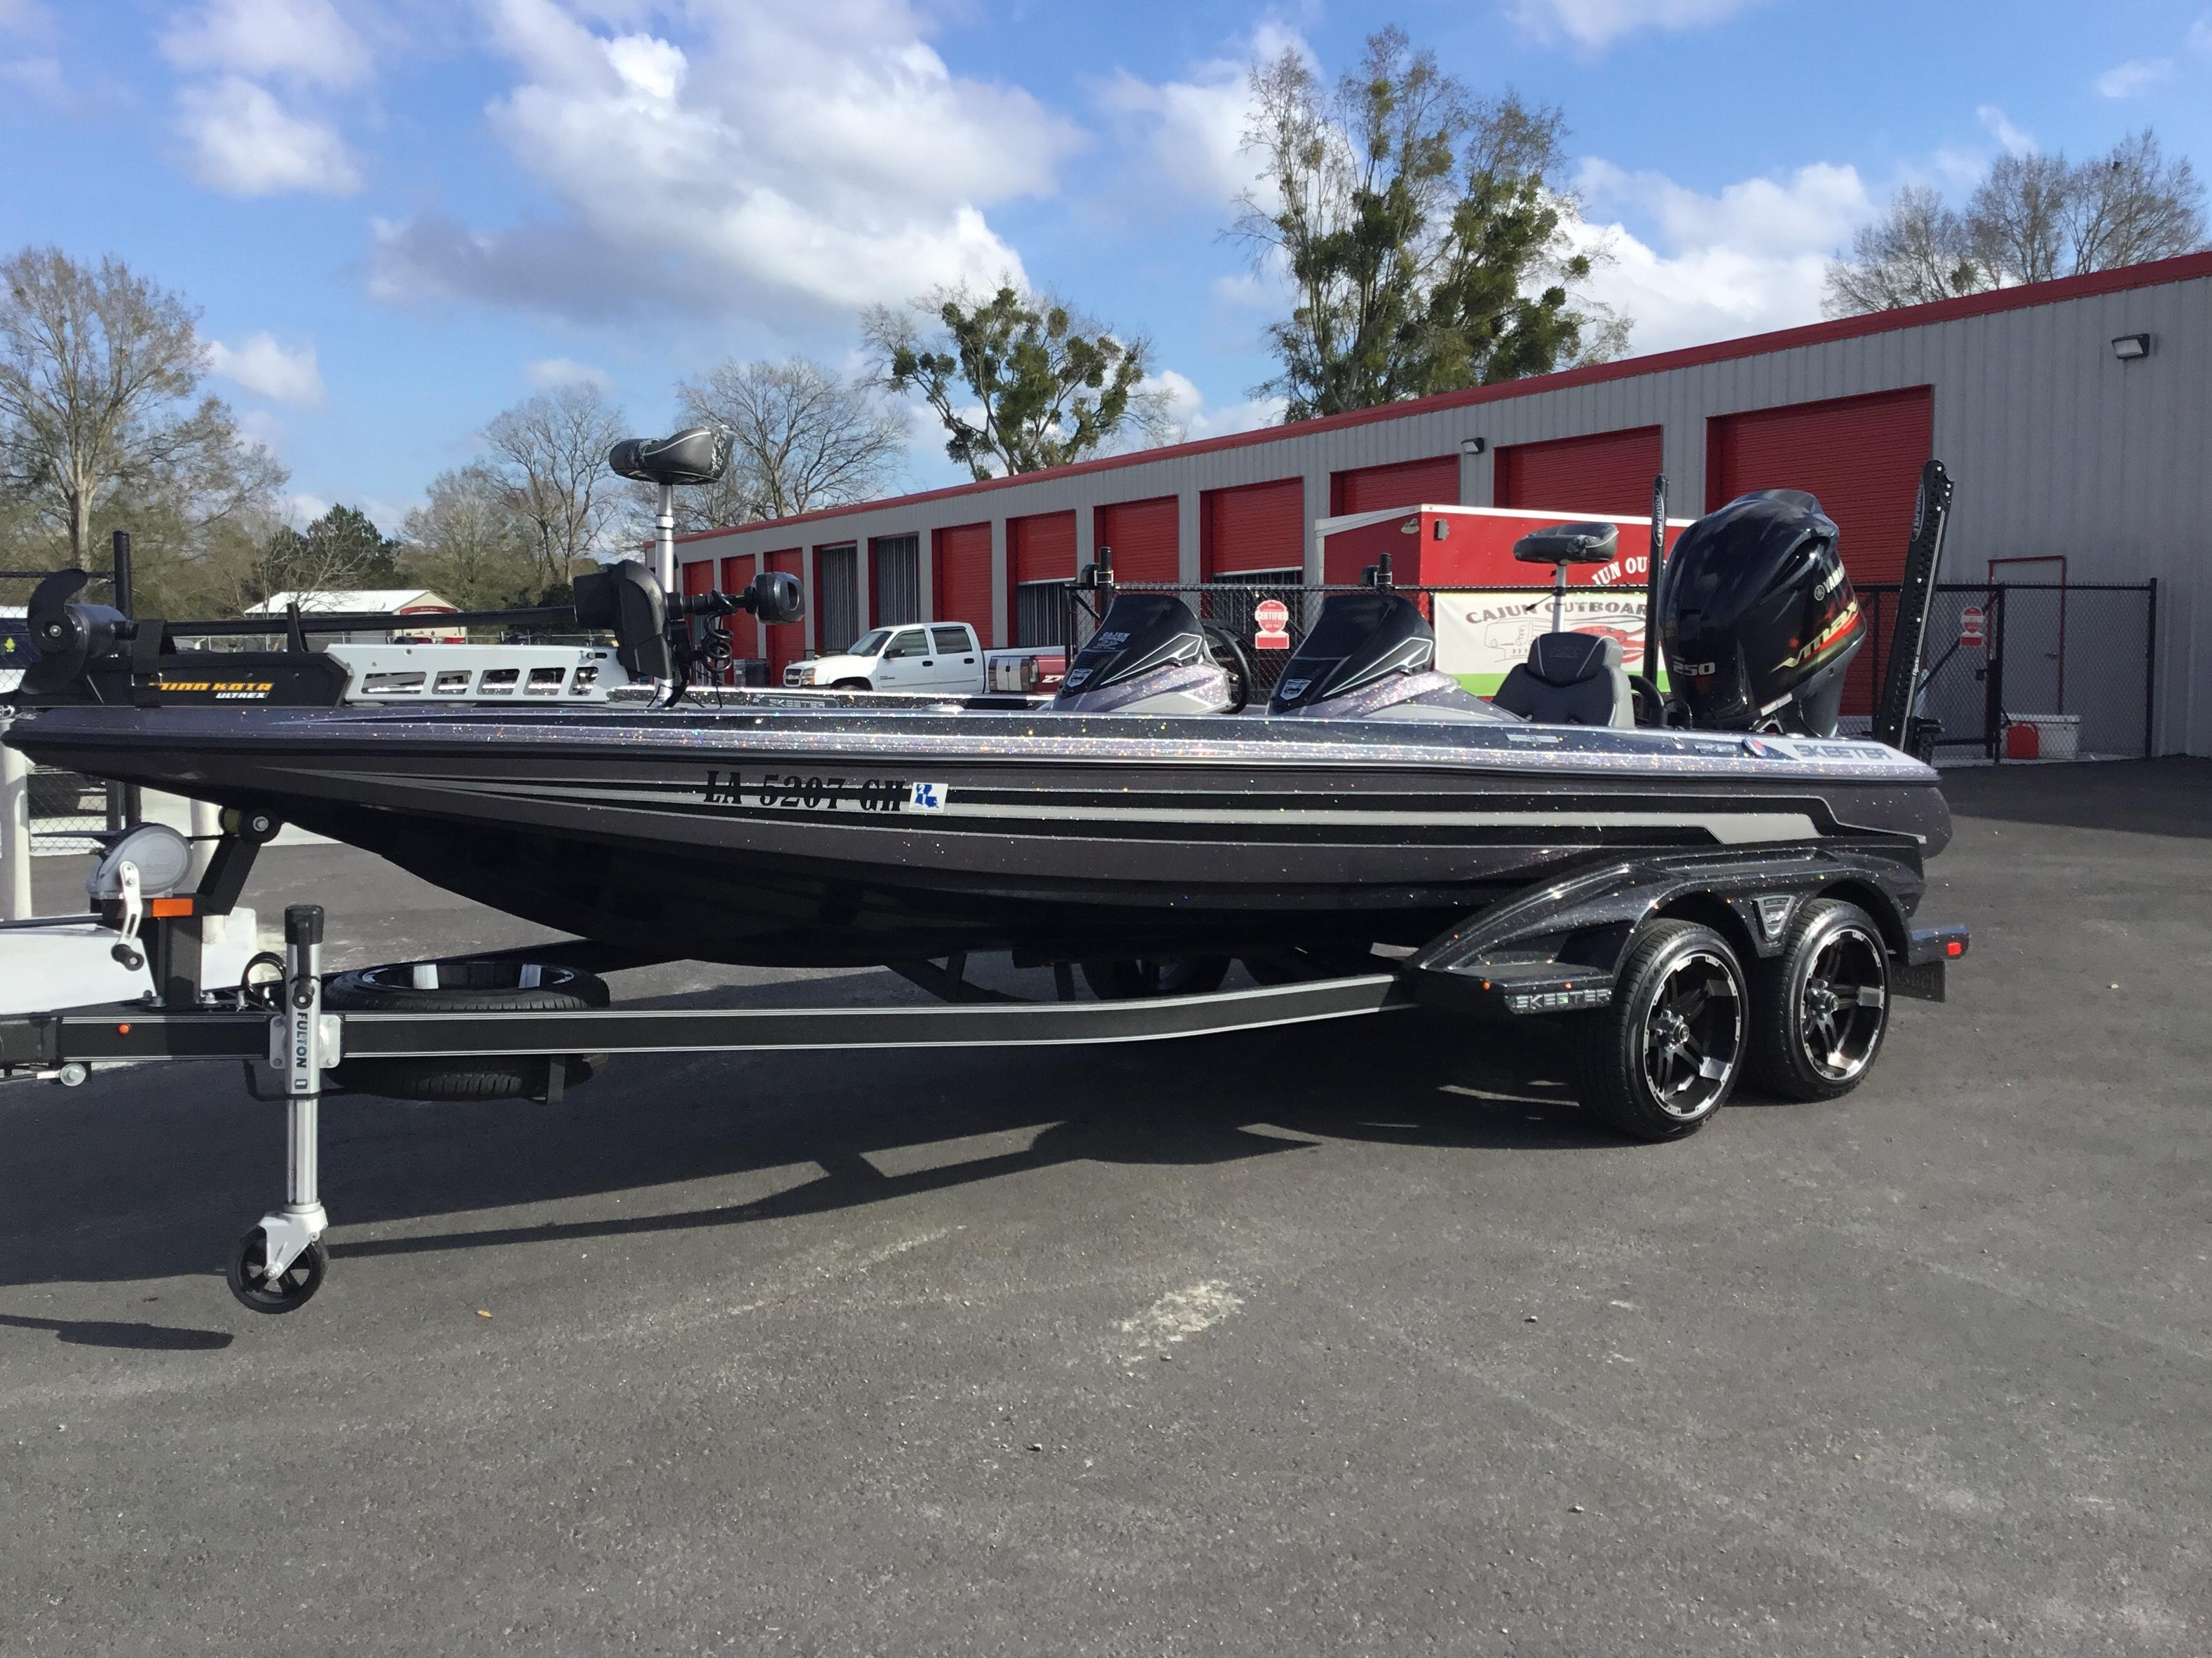 skeeter bass boat for sale - HD3156×2366